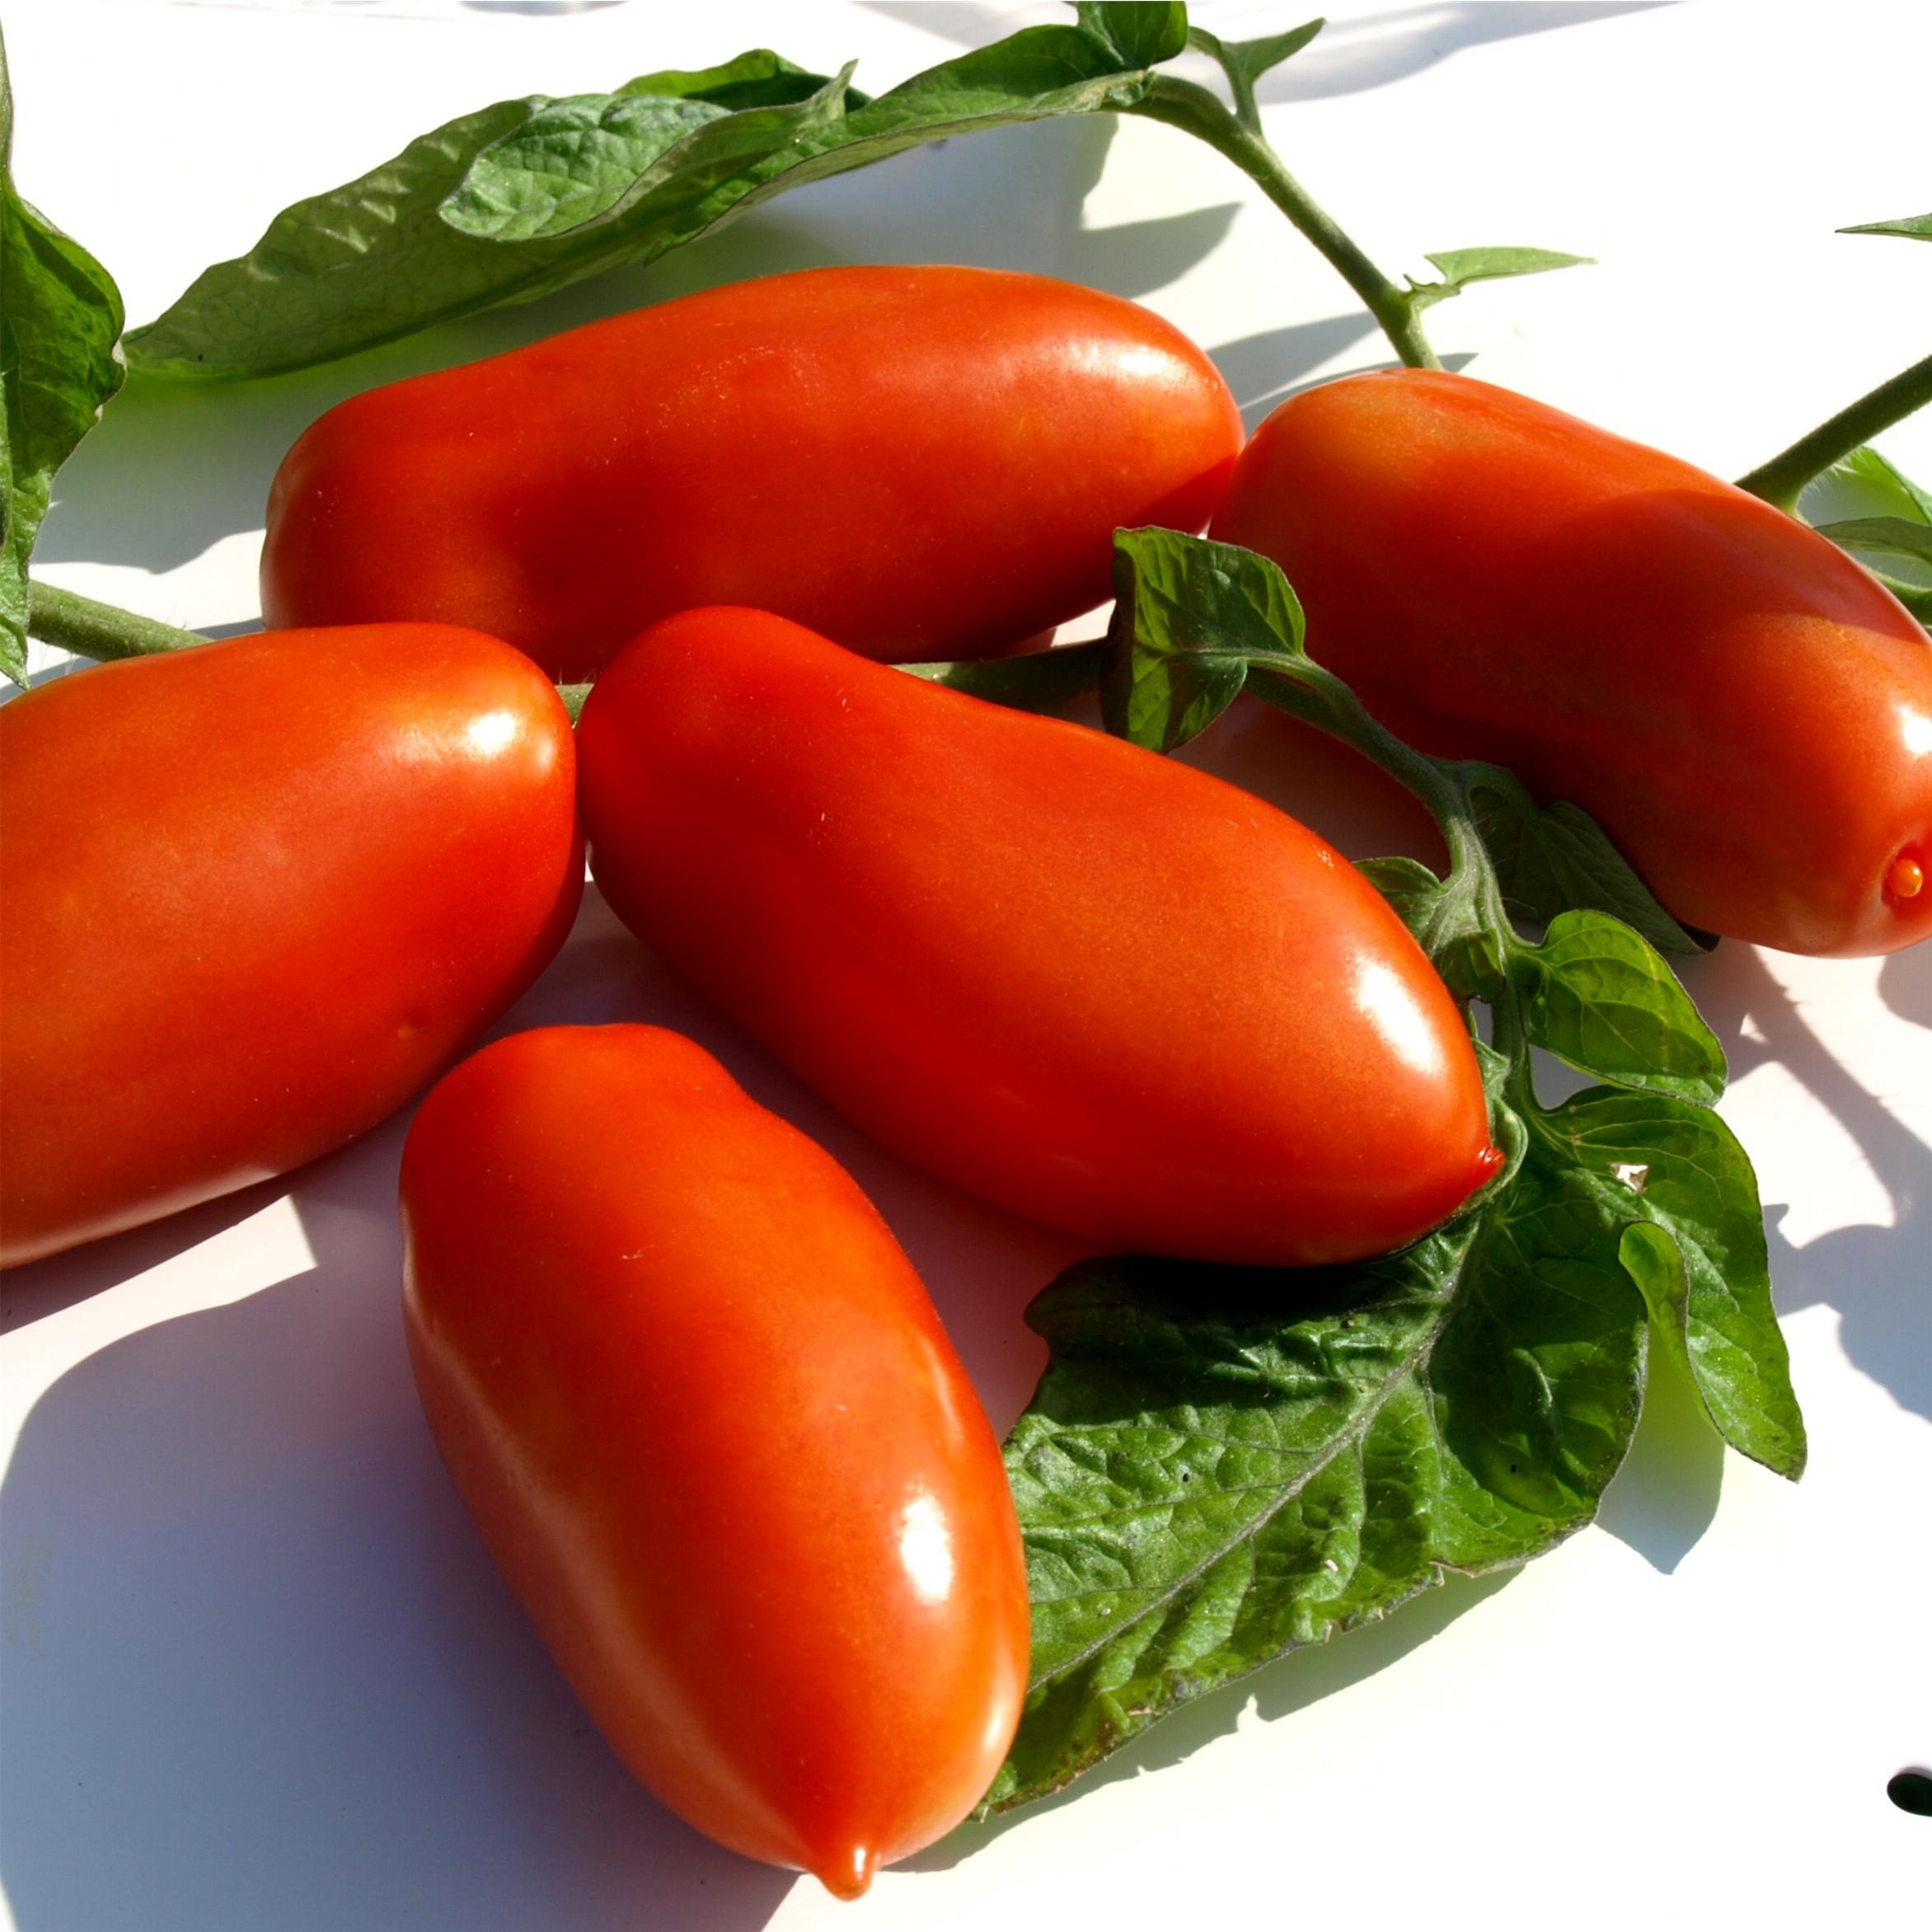 deaflora tomate san marzano. Black Bedroom Furniture Sets. Home Design Ideas